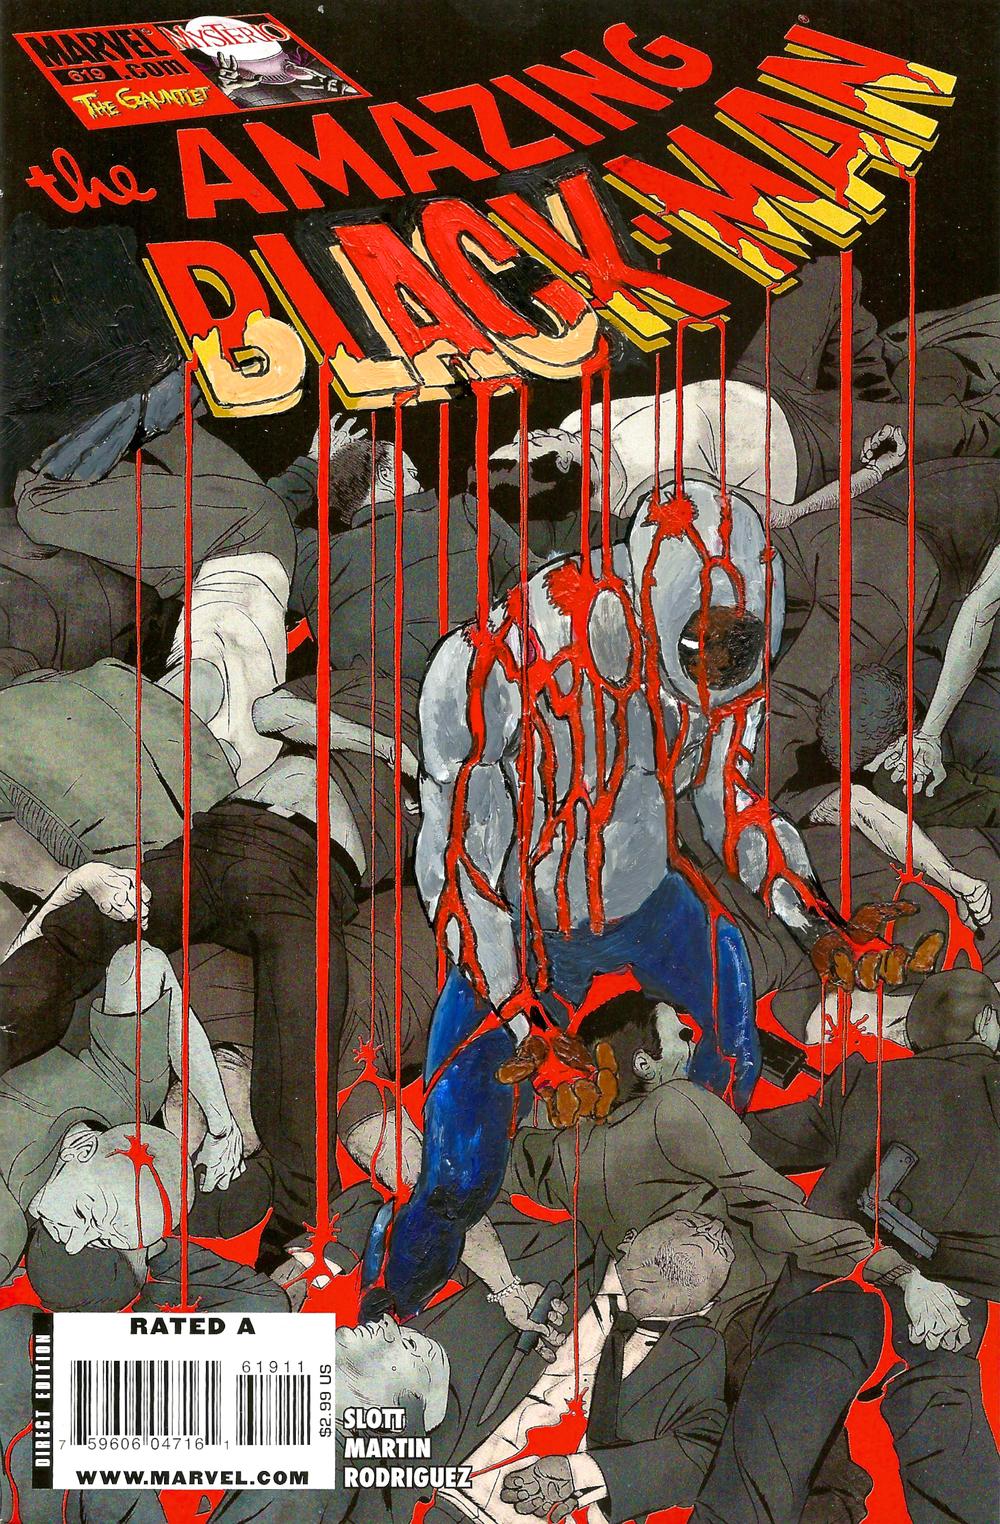 The Amazing Black-Man #619